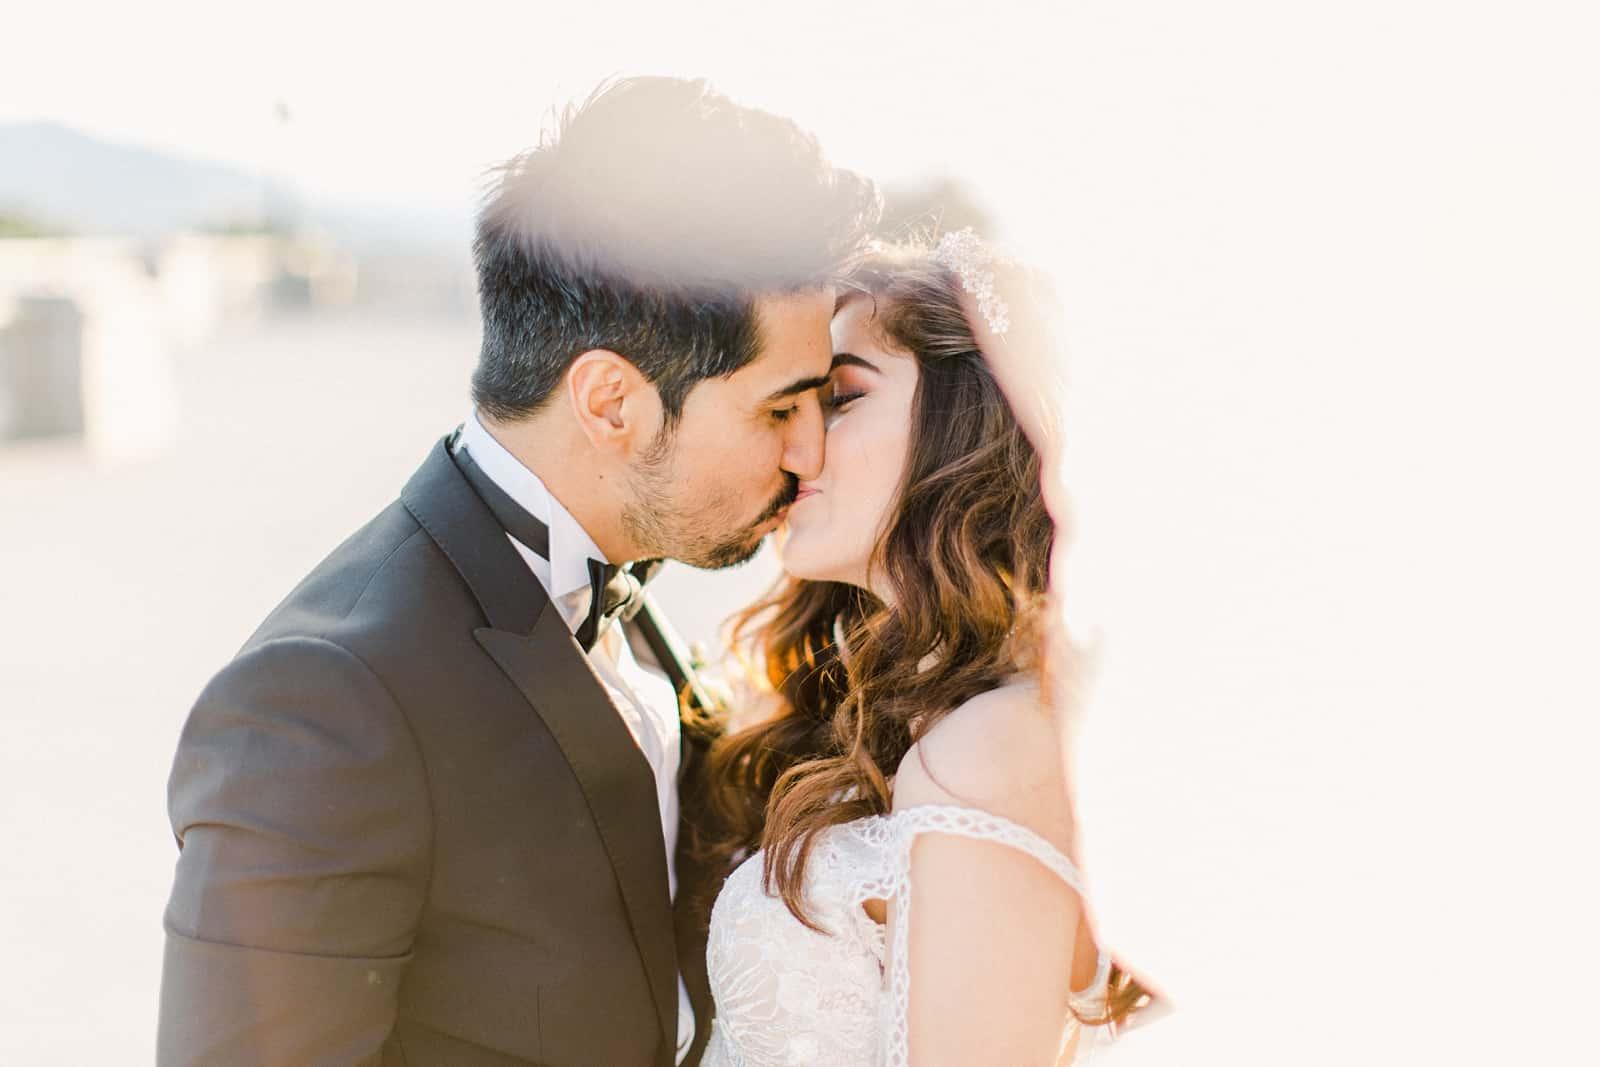 Palestinian Iranian Bride and Groom, Utah Wedding Photography at the Utah State Capitol, long veil kiss sunset light